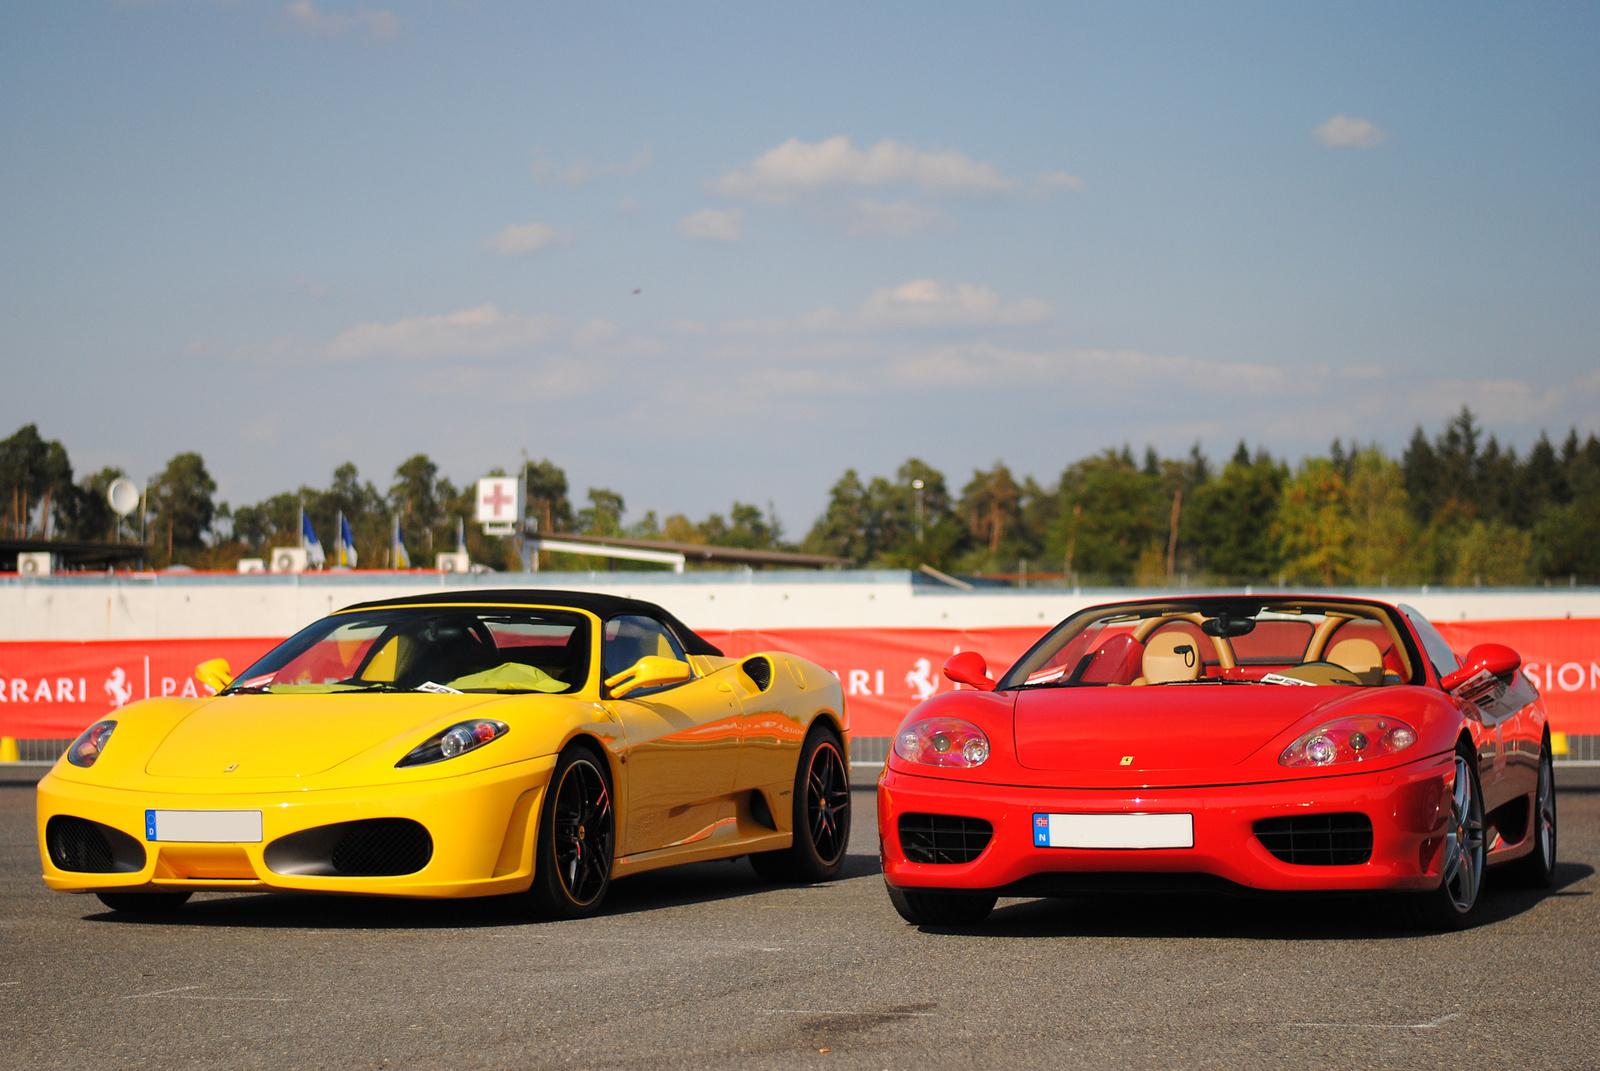 Ferrari F430 Spider - Ferrari 360 Spider